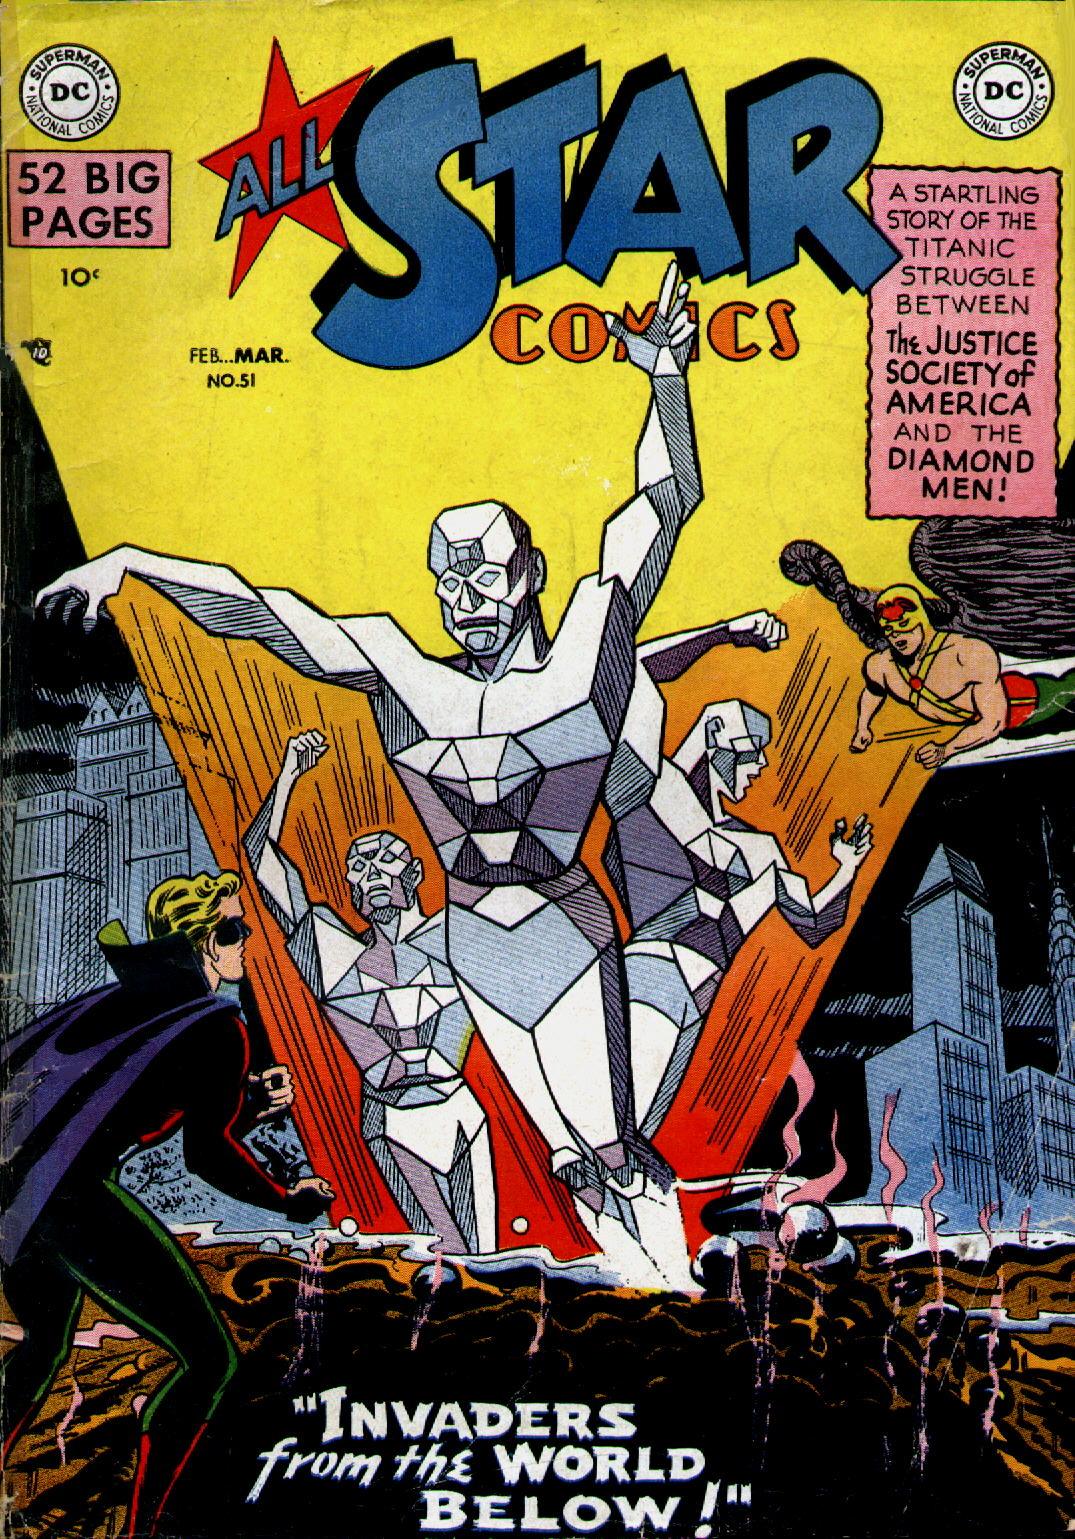 Read online All-Star Comics comic -  Issue #51 - 1